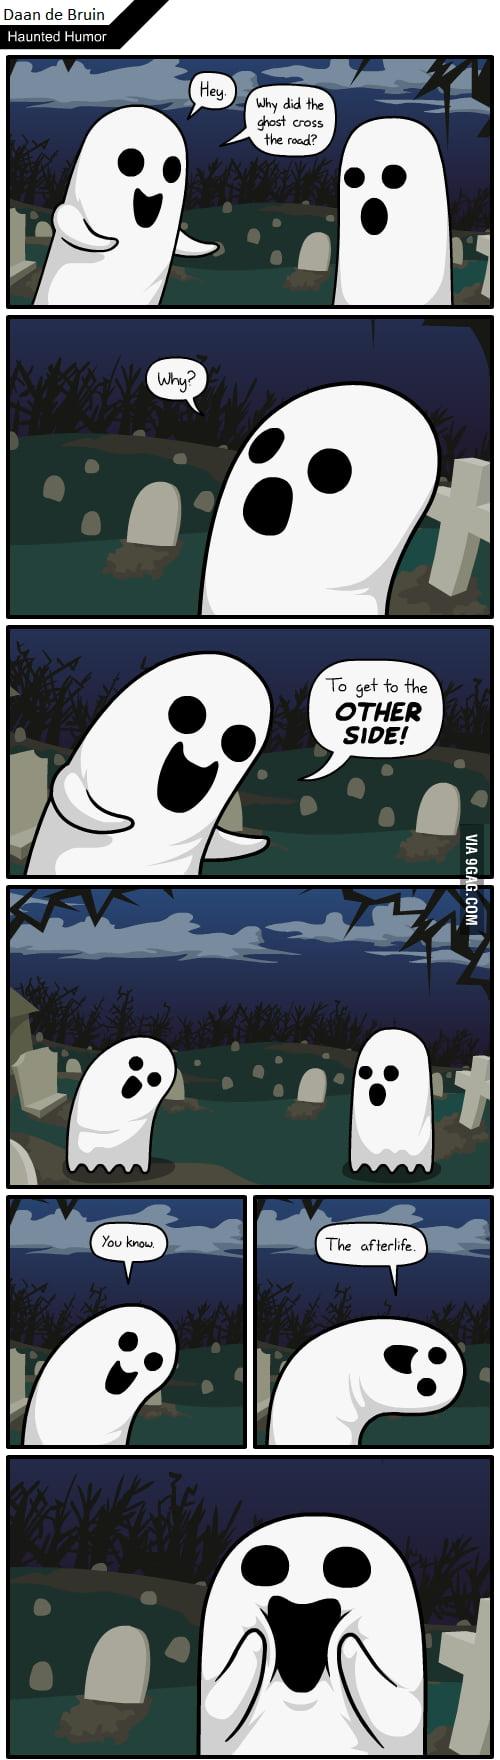 Haunted humor.